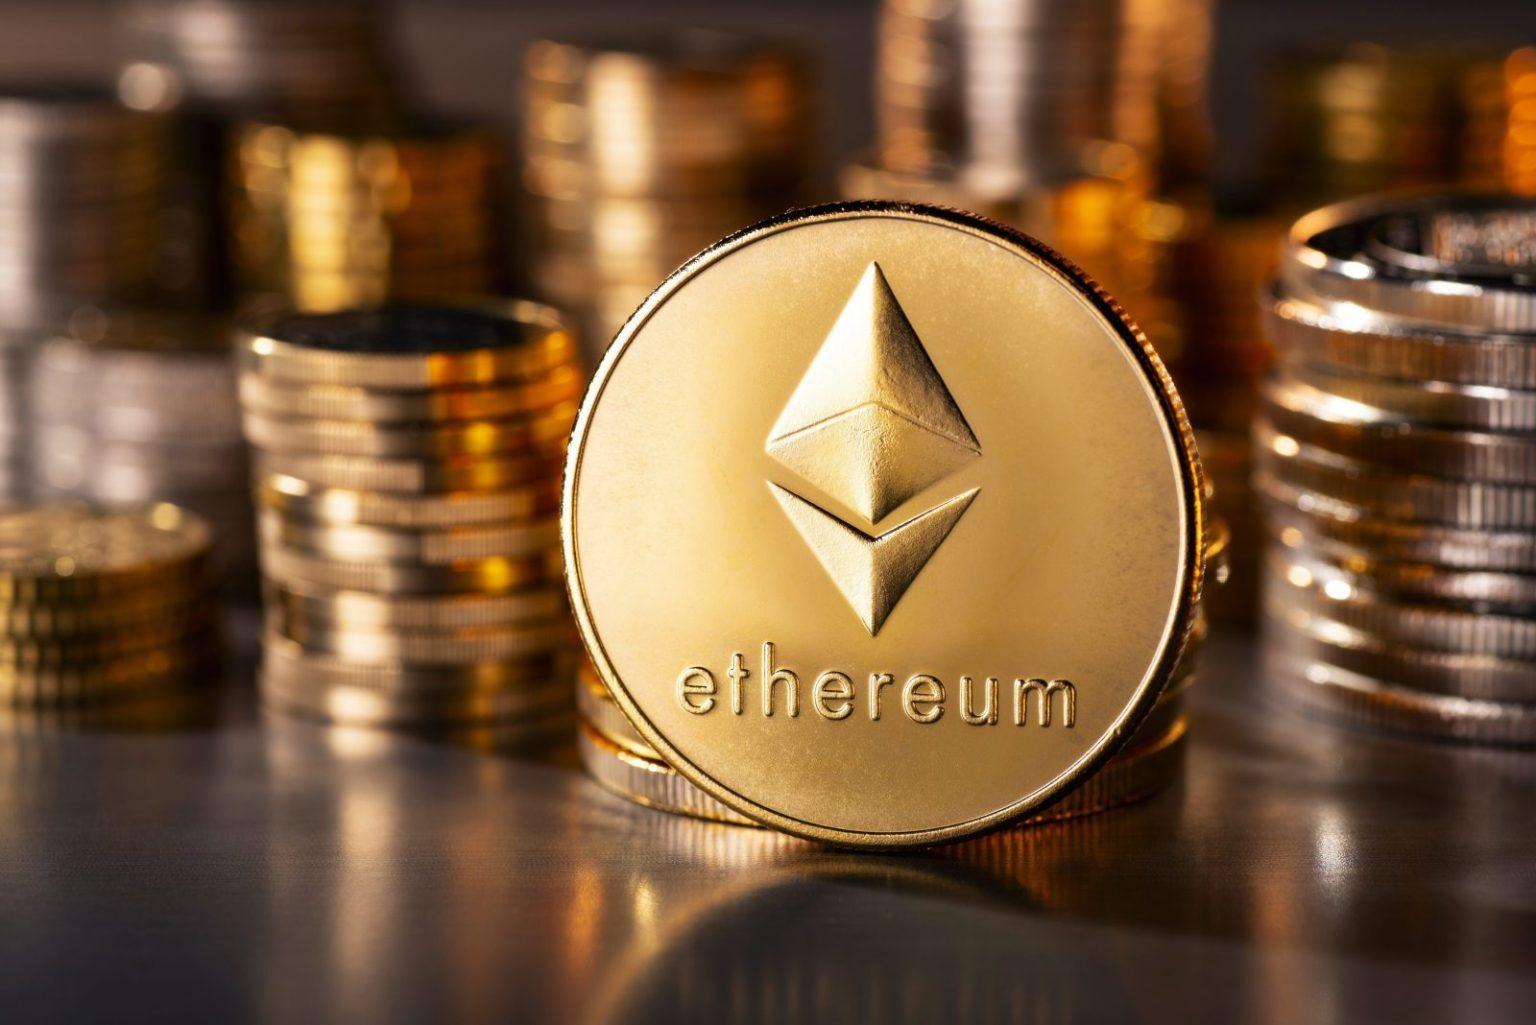 Ethereum makes fresh highs